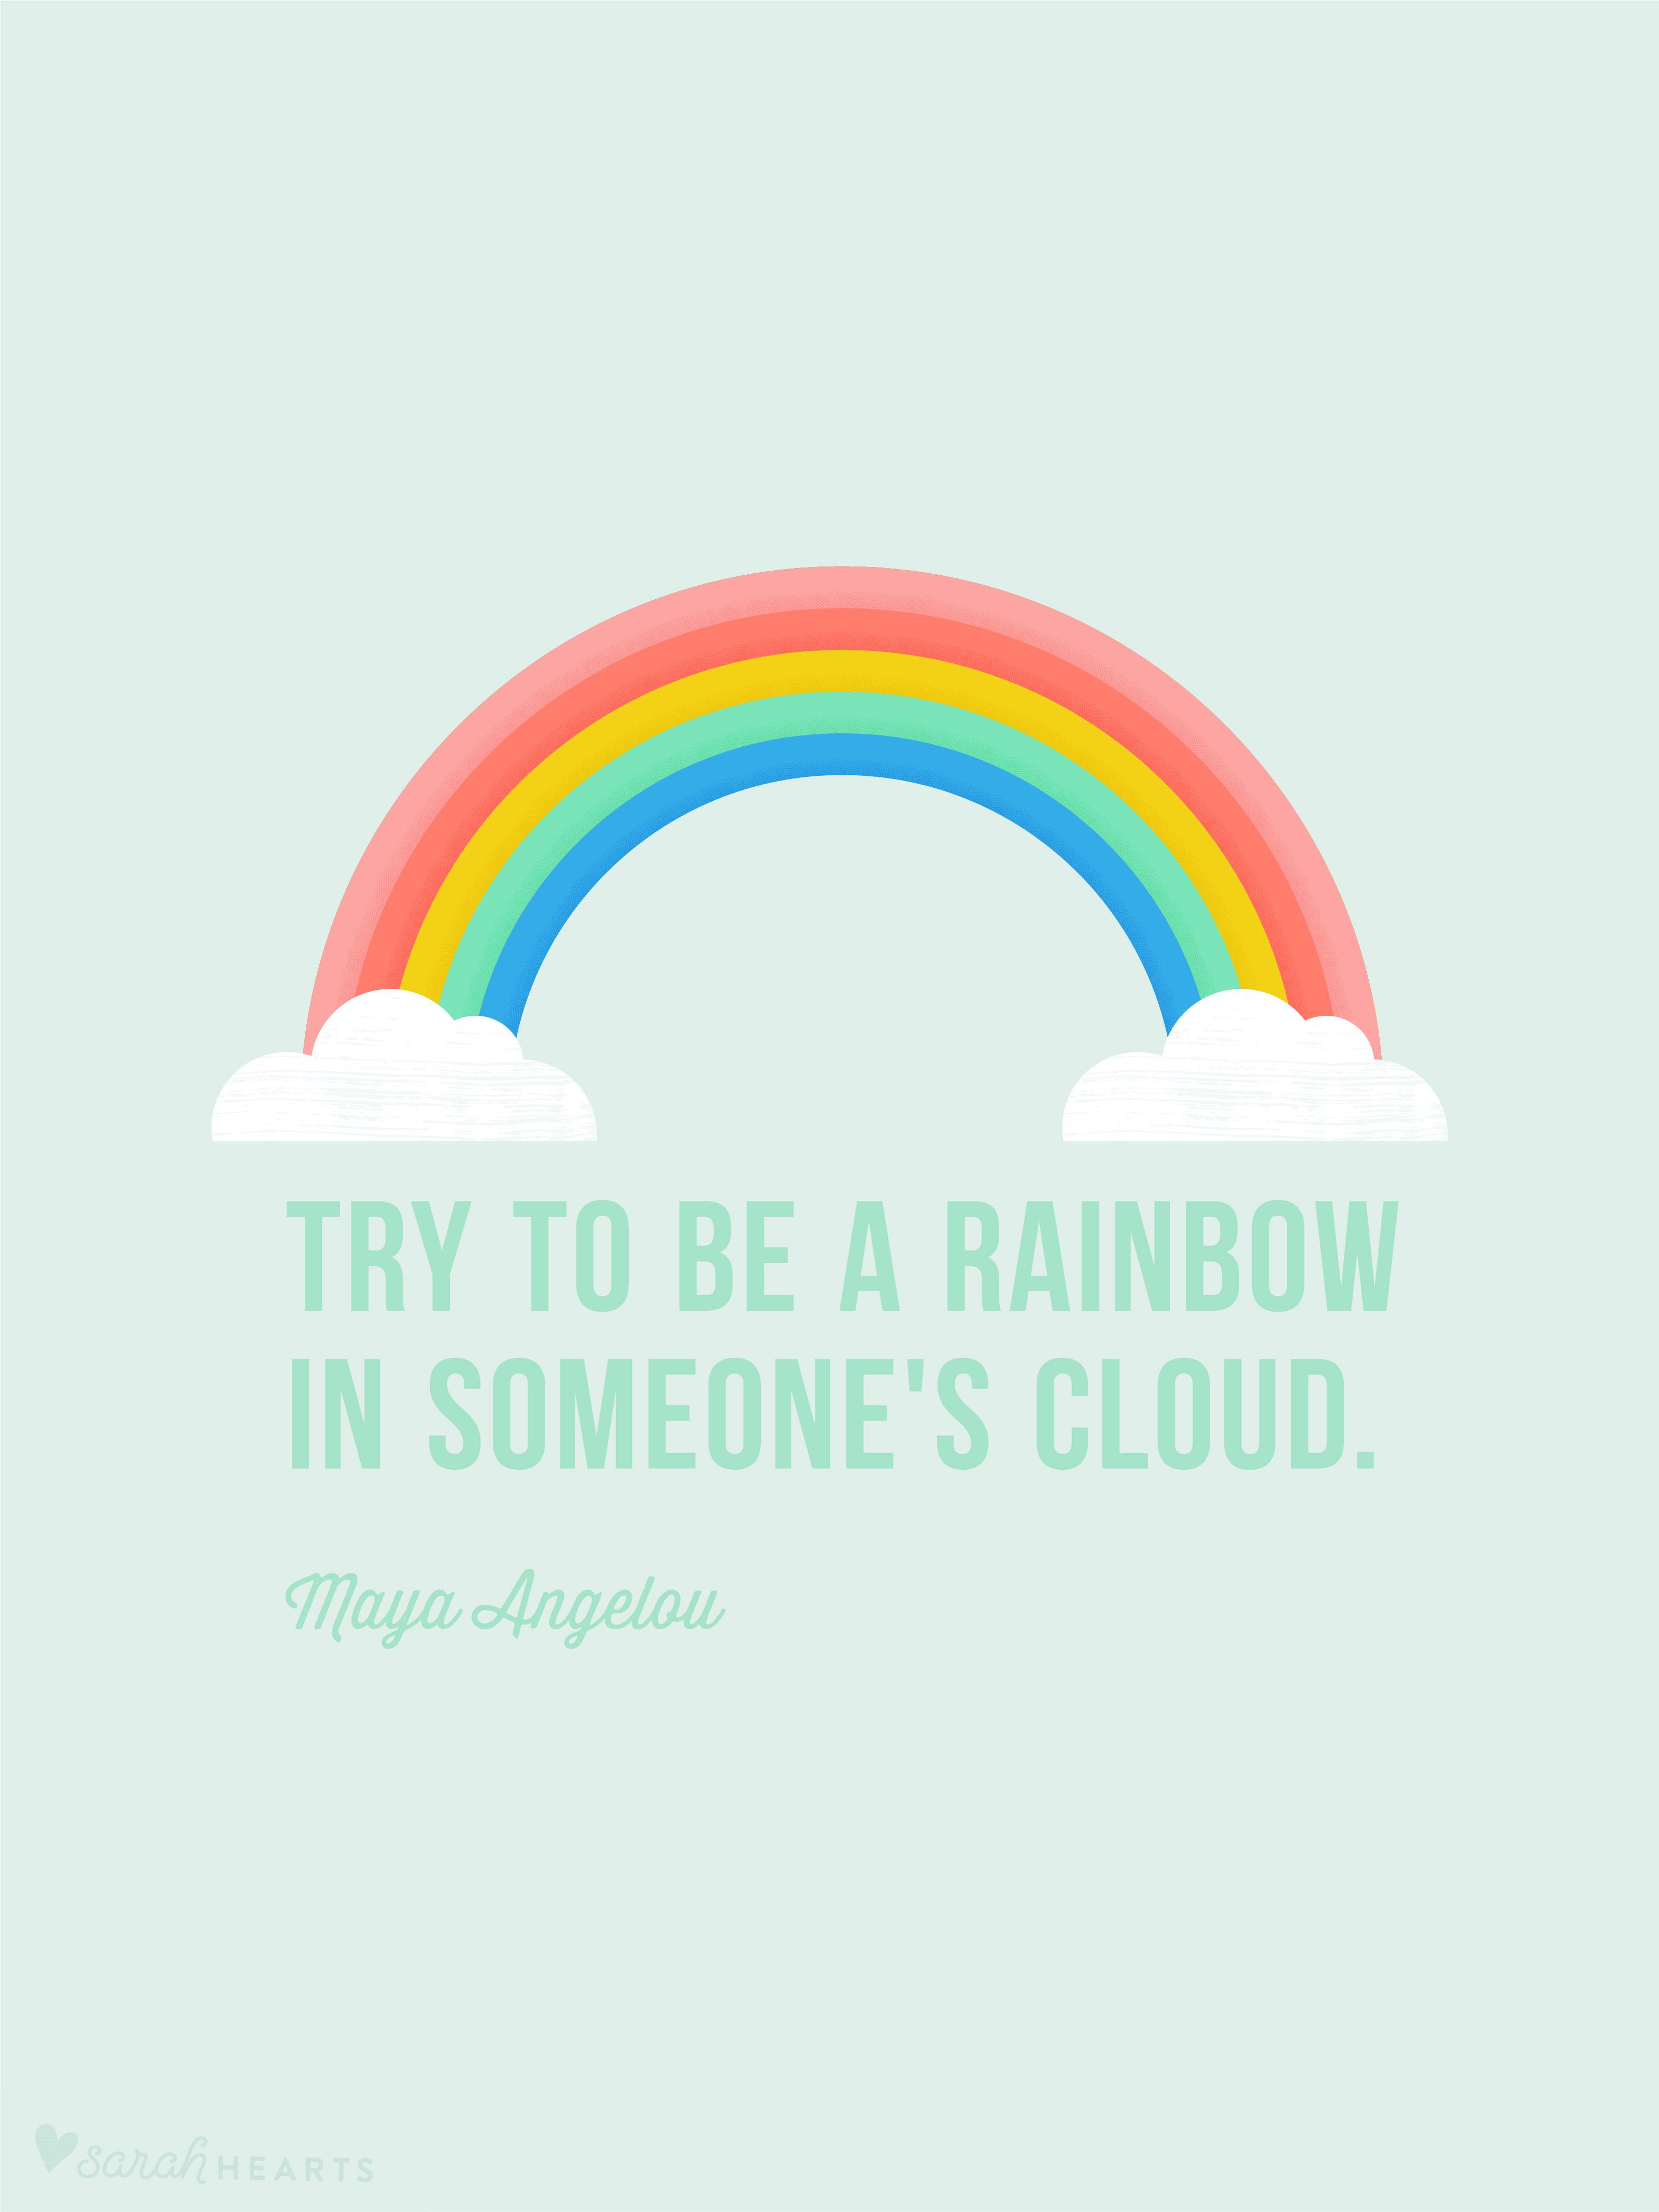 You Can Do It Quotes Wallpaper Rainbow March 2017 Calendar Wallpaper Sarah Hearts